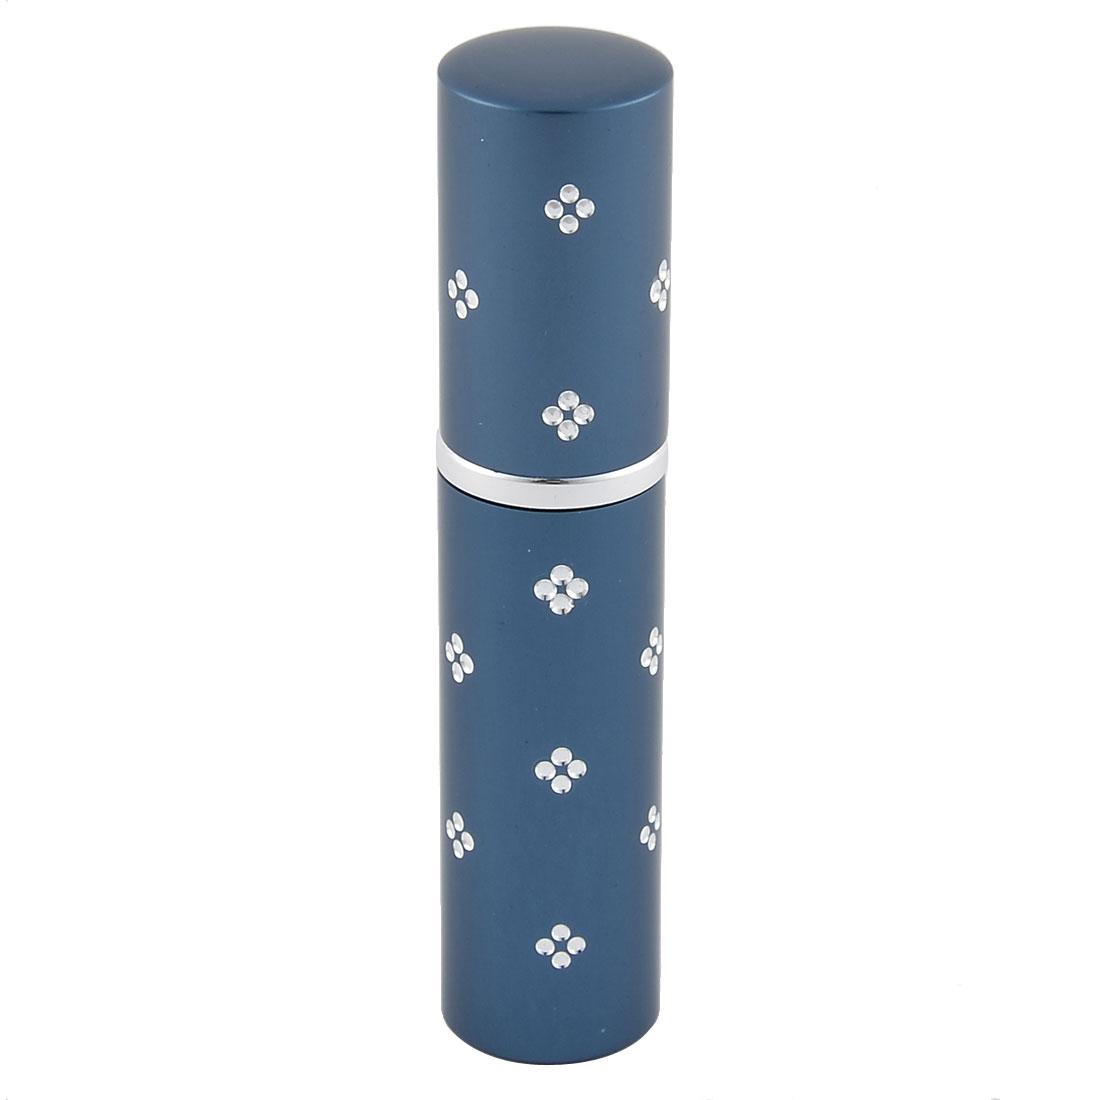 5mL Travel Portable Flower Decor Mini Refillable Scent Perfume Spray Bottle Blue